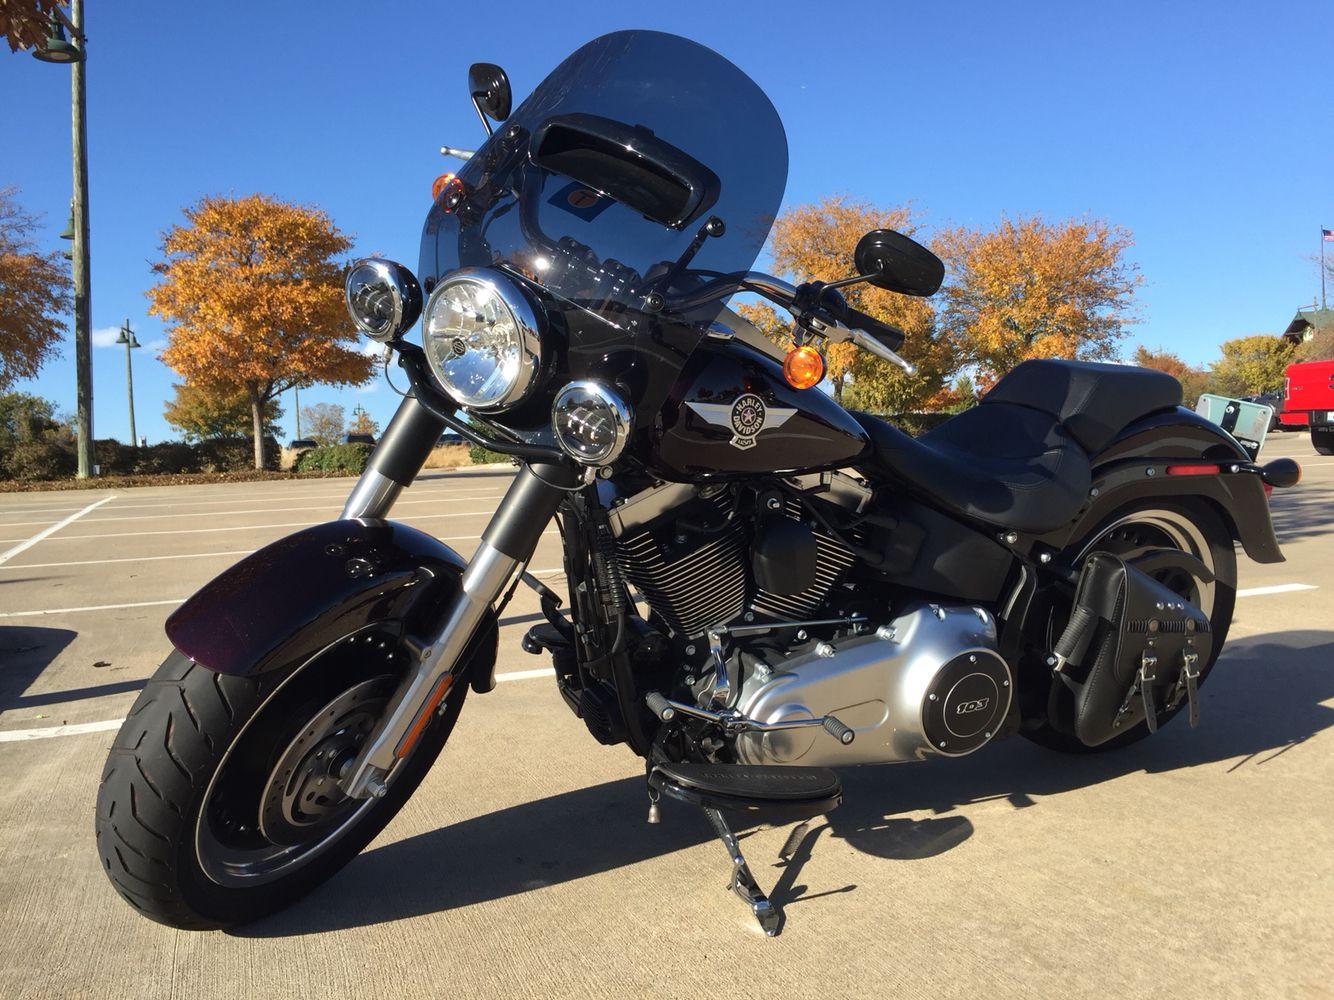 My new ride, a 2014 Fat Boy Lo in blackened cayenne sunglo. #HarleyDavidson #motorcycles